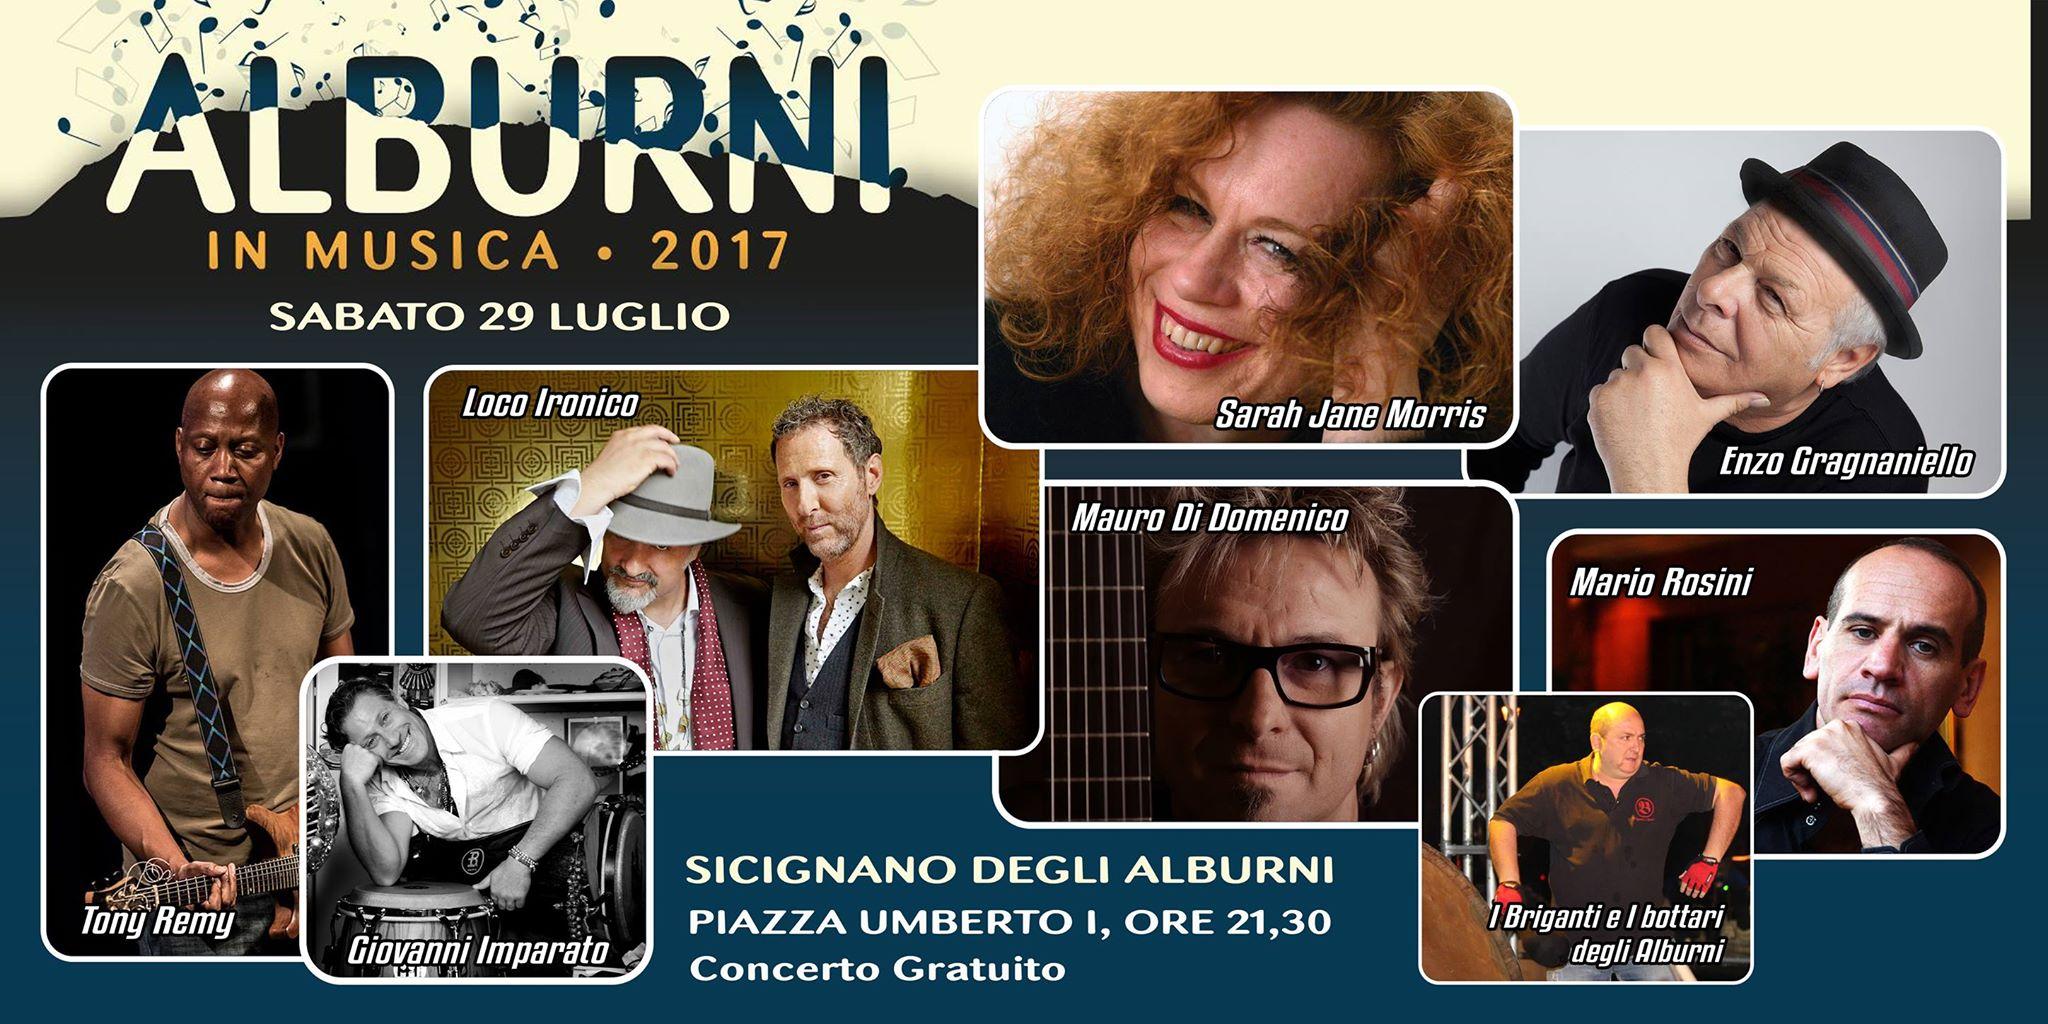 http://www.salernonotizie.net/wp-content/uploads/2017/07/alburniinmusica.jpg